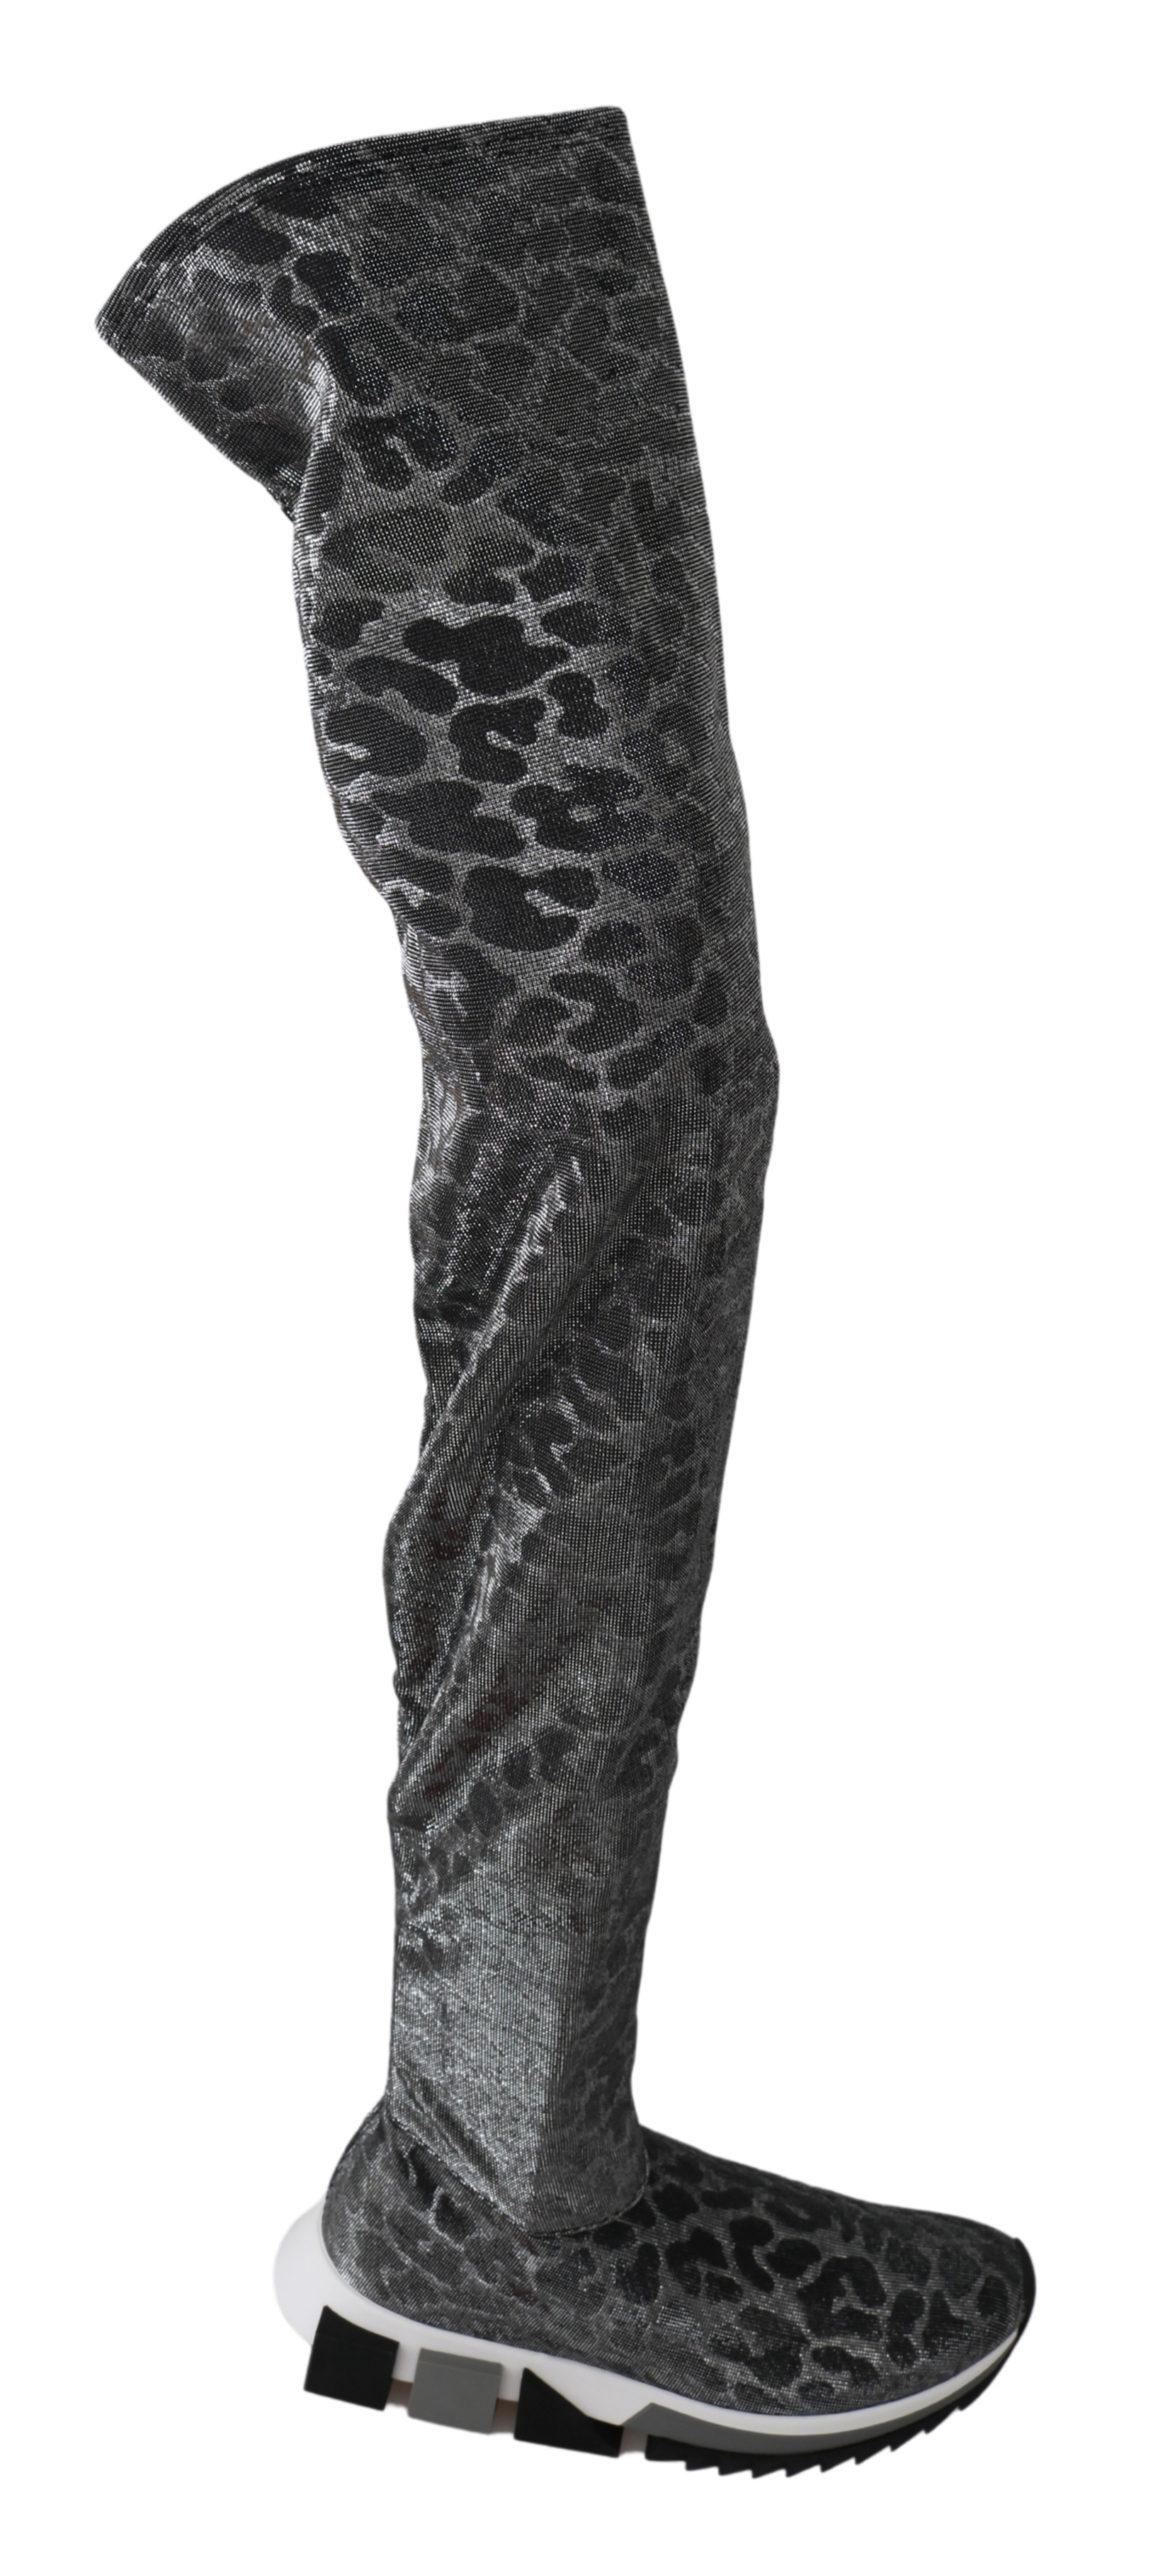 Dolce & Gabbana Women's Leopard High Top Booties Trainer Gray LA6442 - EU35/US4.5